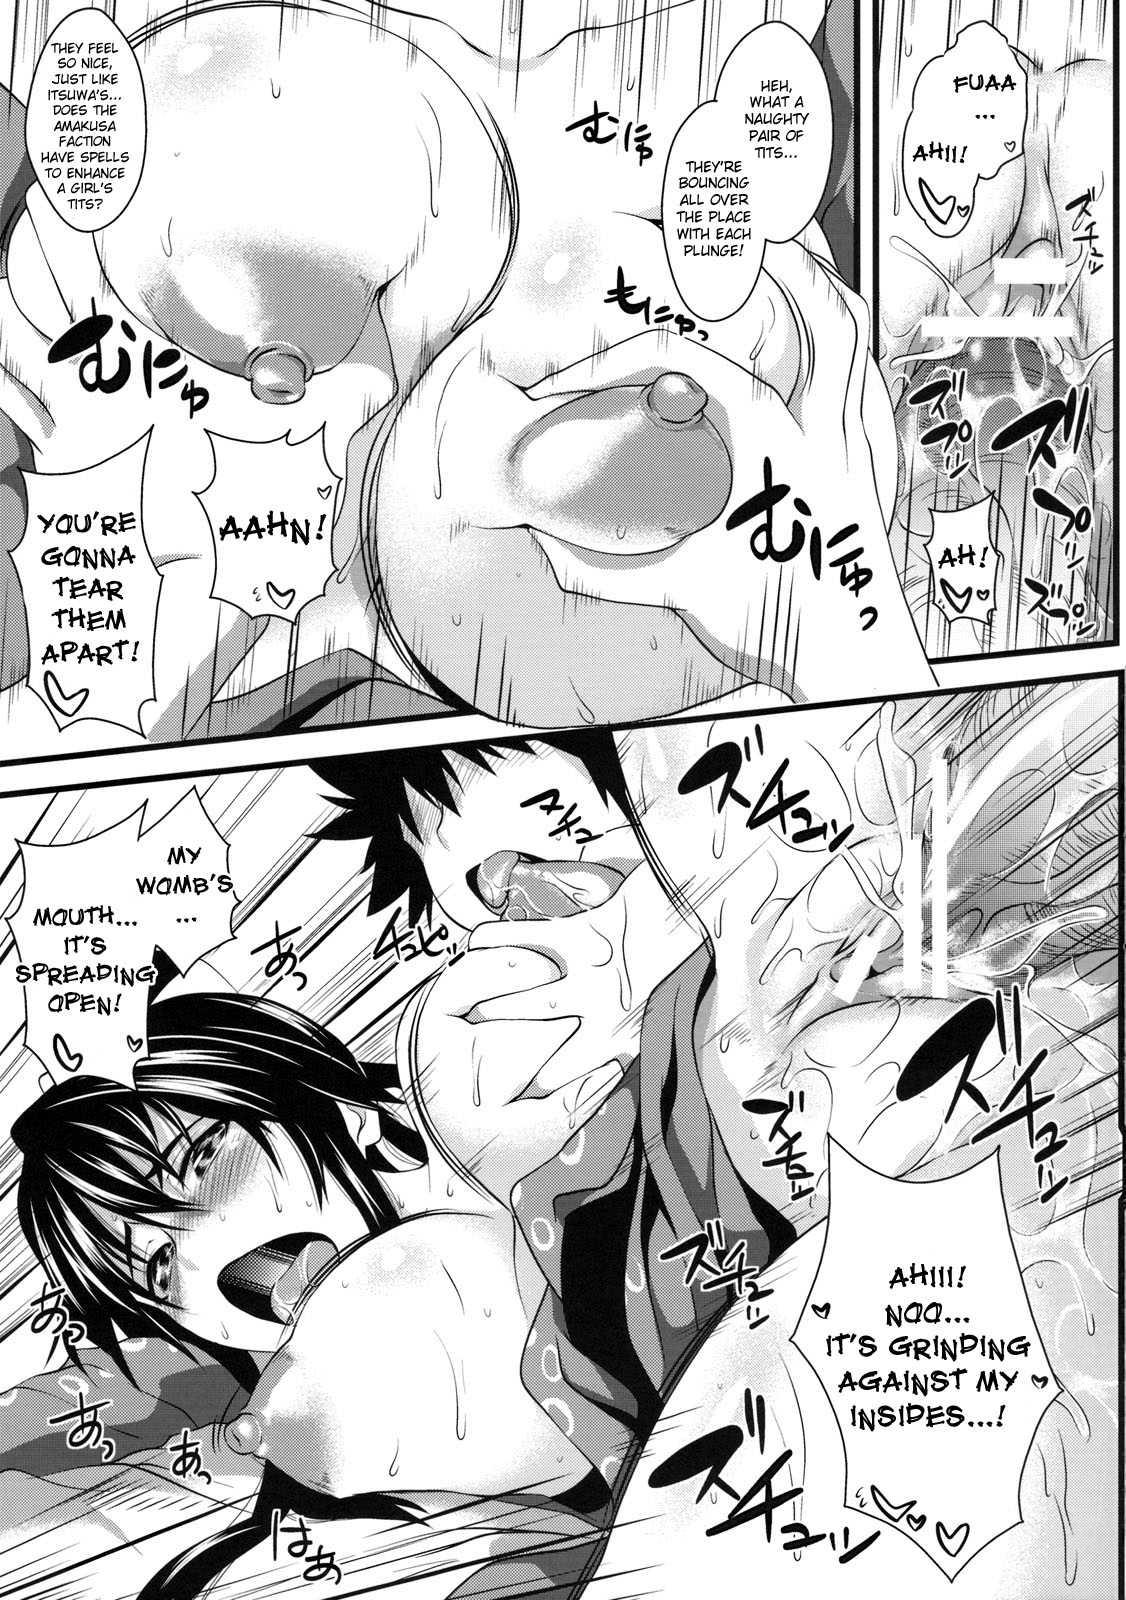 Amakusa Moyou Na reading amakusa moyou na (doujinshi) hentaisaz (soba